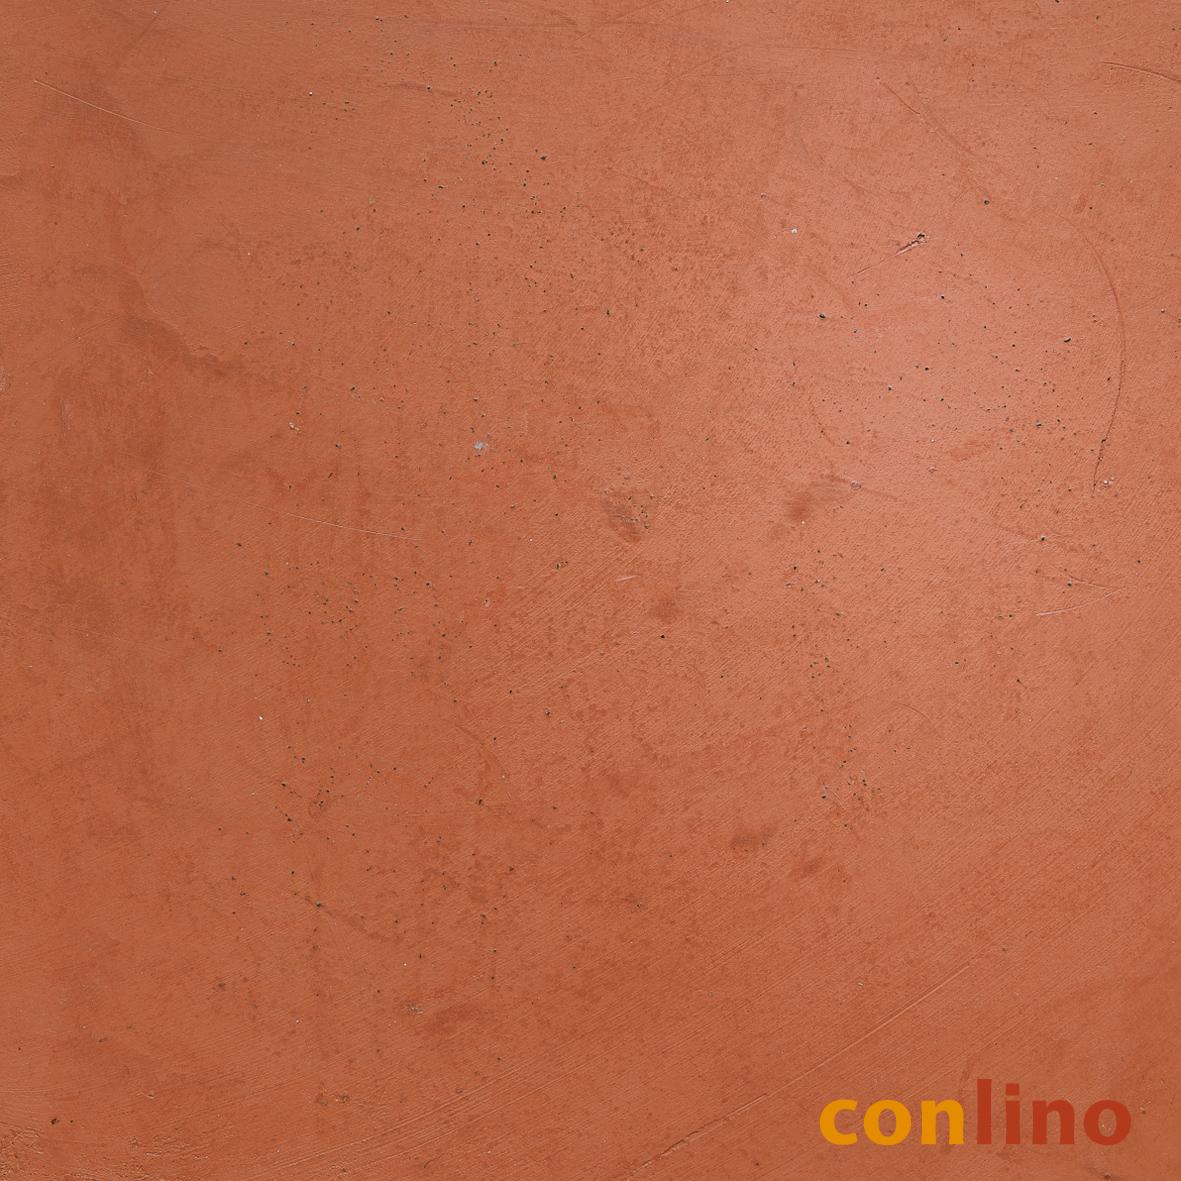 conlino Lehm-Glätte Lehmrot CG 120